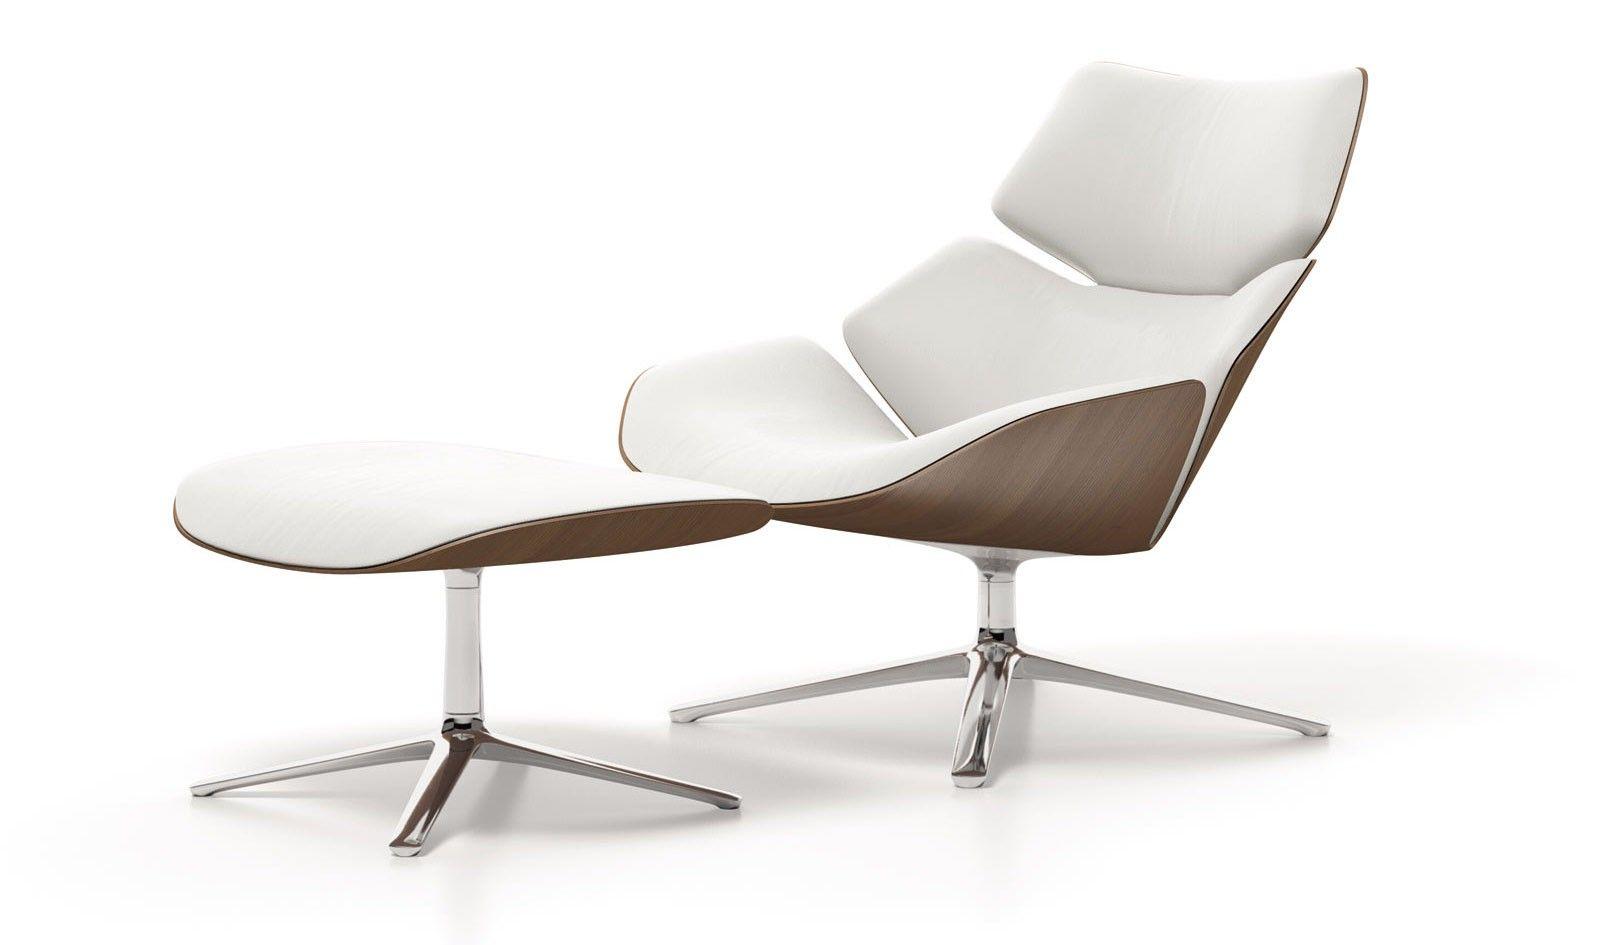 Sessel Und Hocker Kuchenplanung Sessel Design Moderne Sessel Sessel Mit Hocker